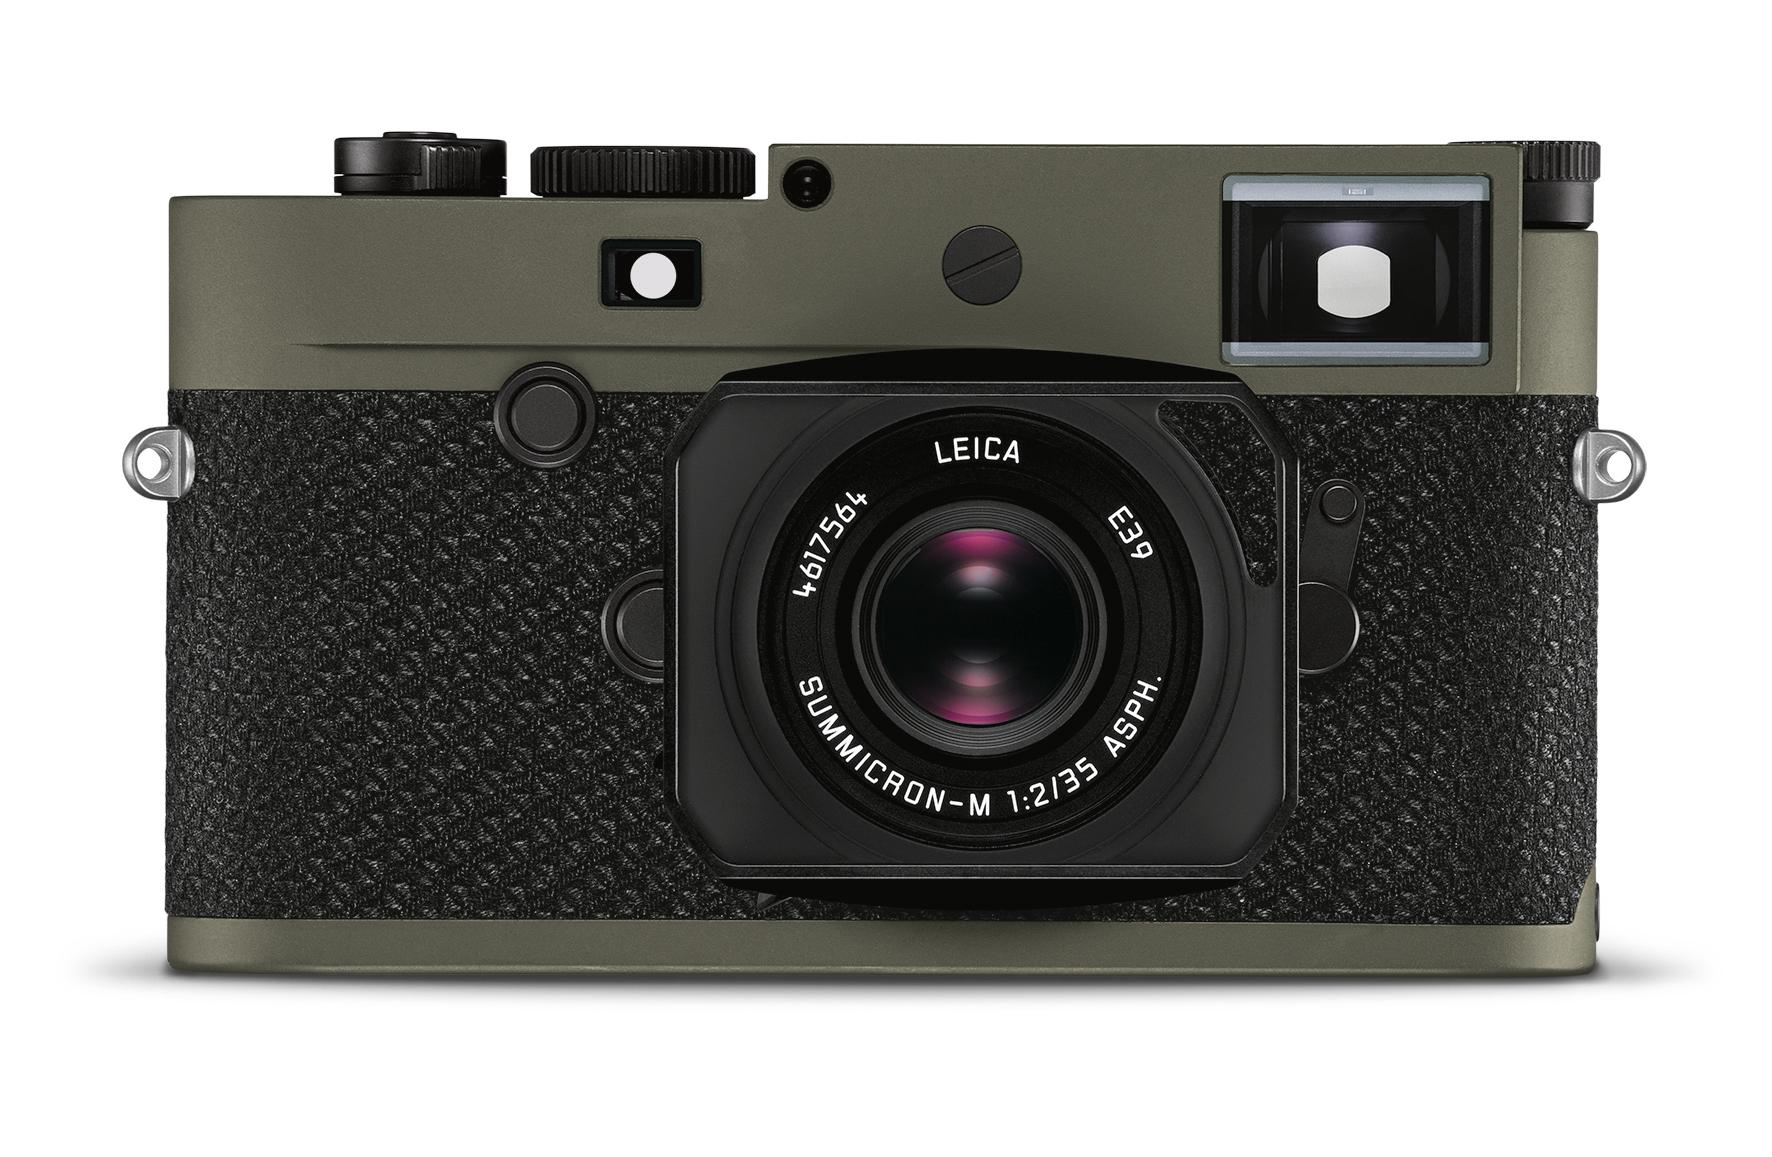 Leica выпустила камеру M10-P Reporter лимитированной серии (M10 P Reporter Body FRONT Summicron RGB)